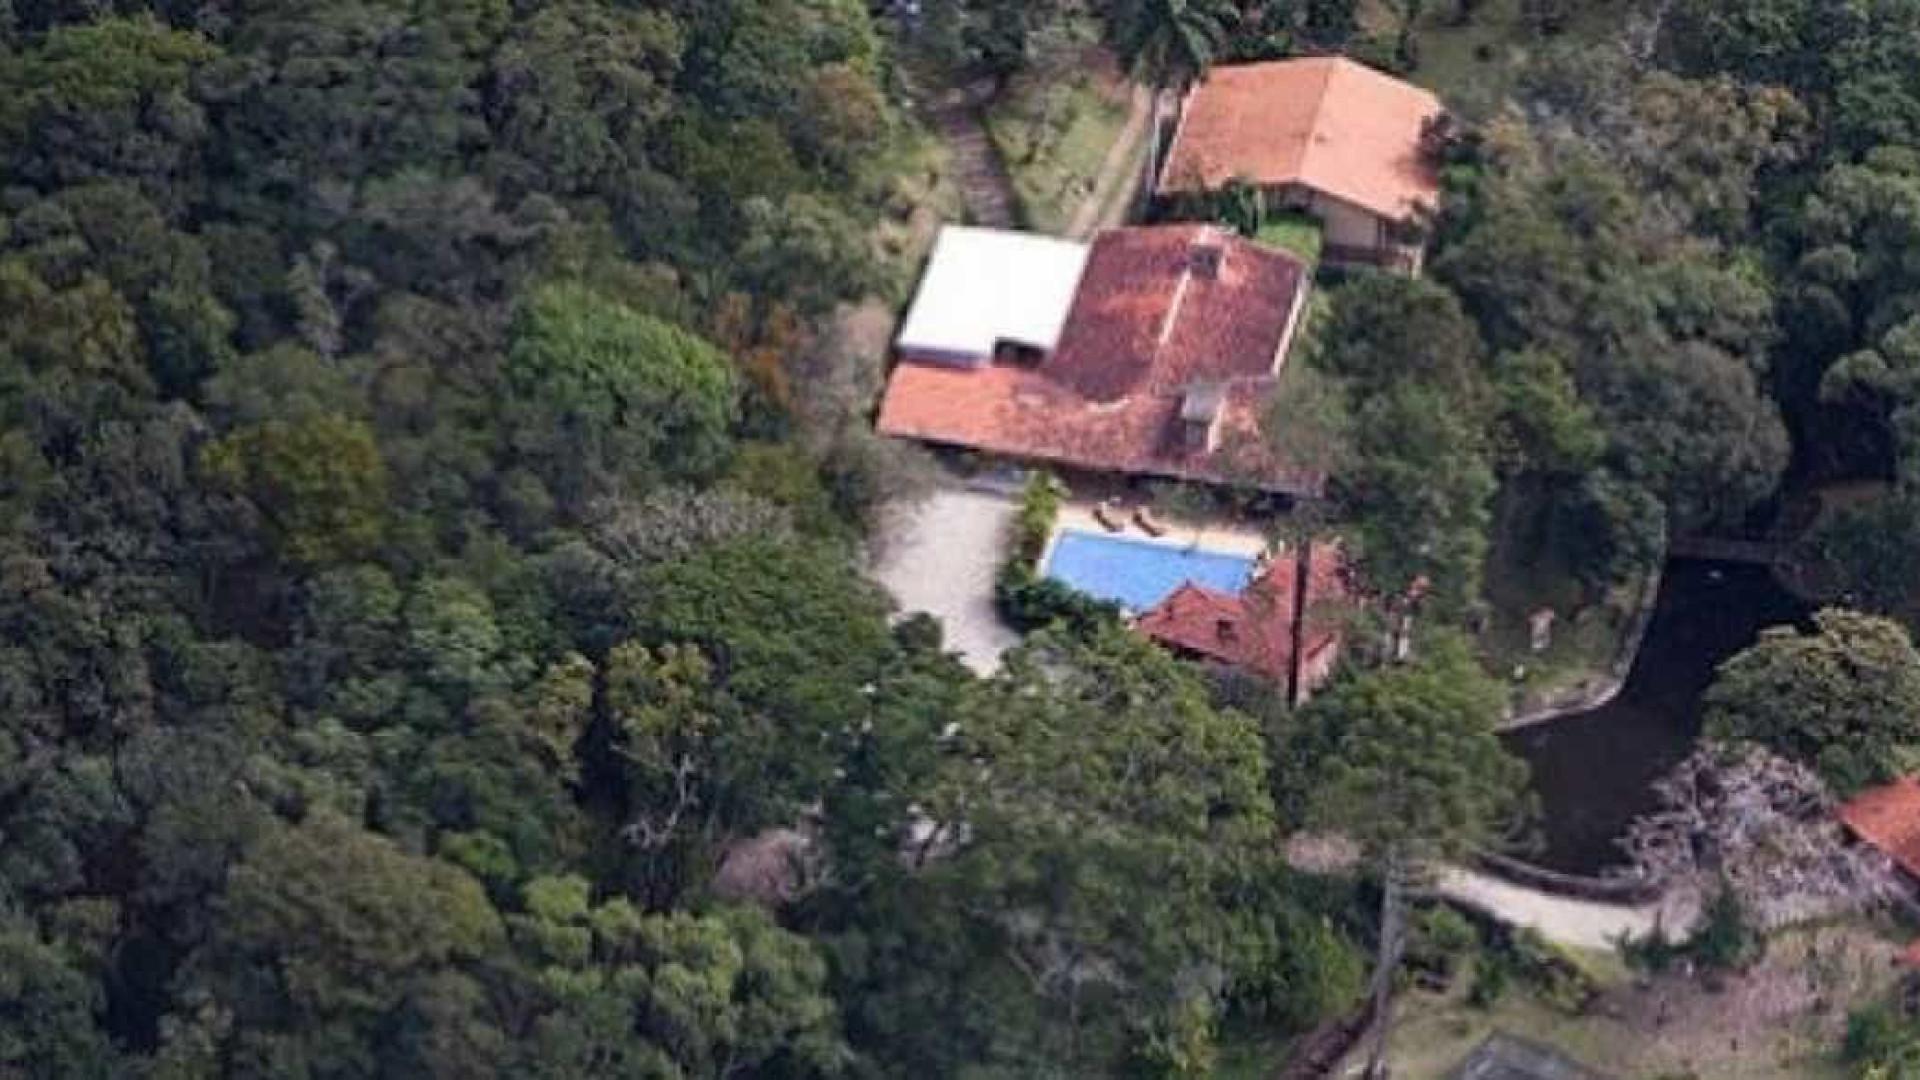 Lula acusa juiz Sérgio Moro de desacato ao Supremo